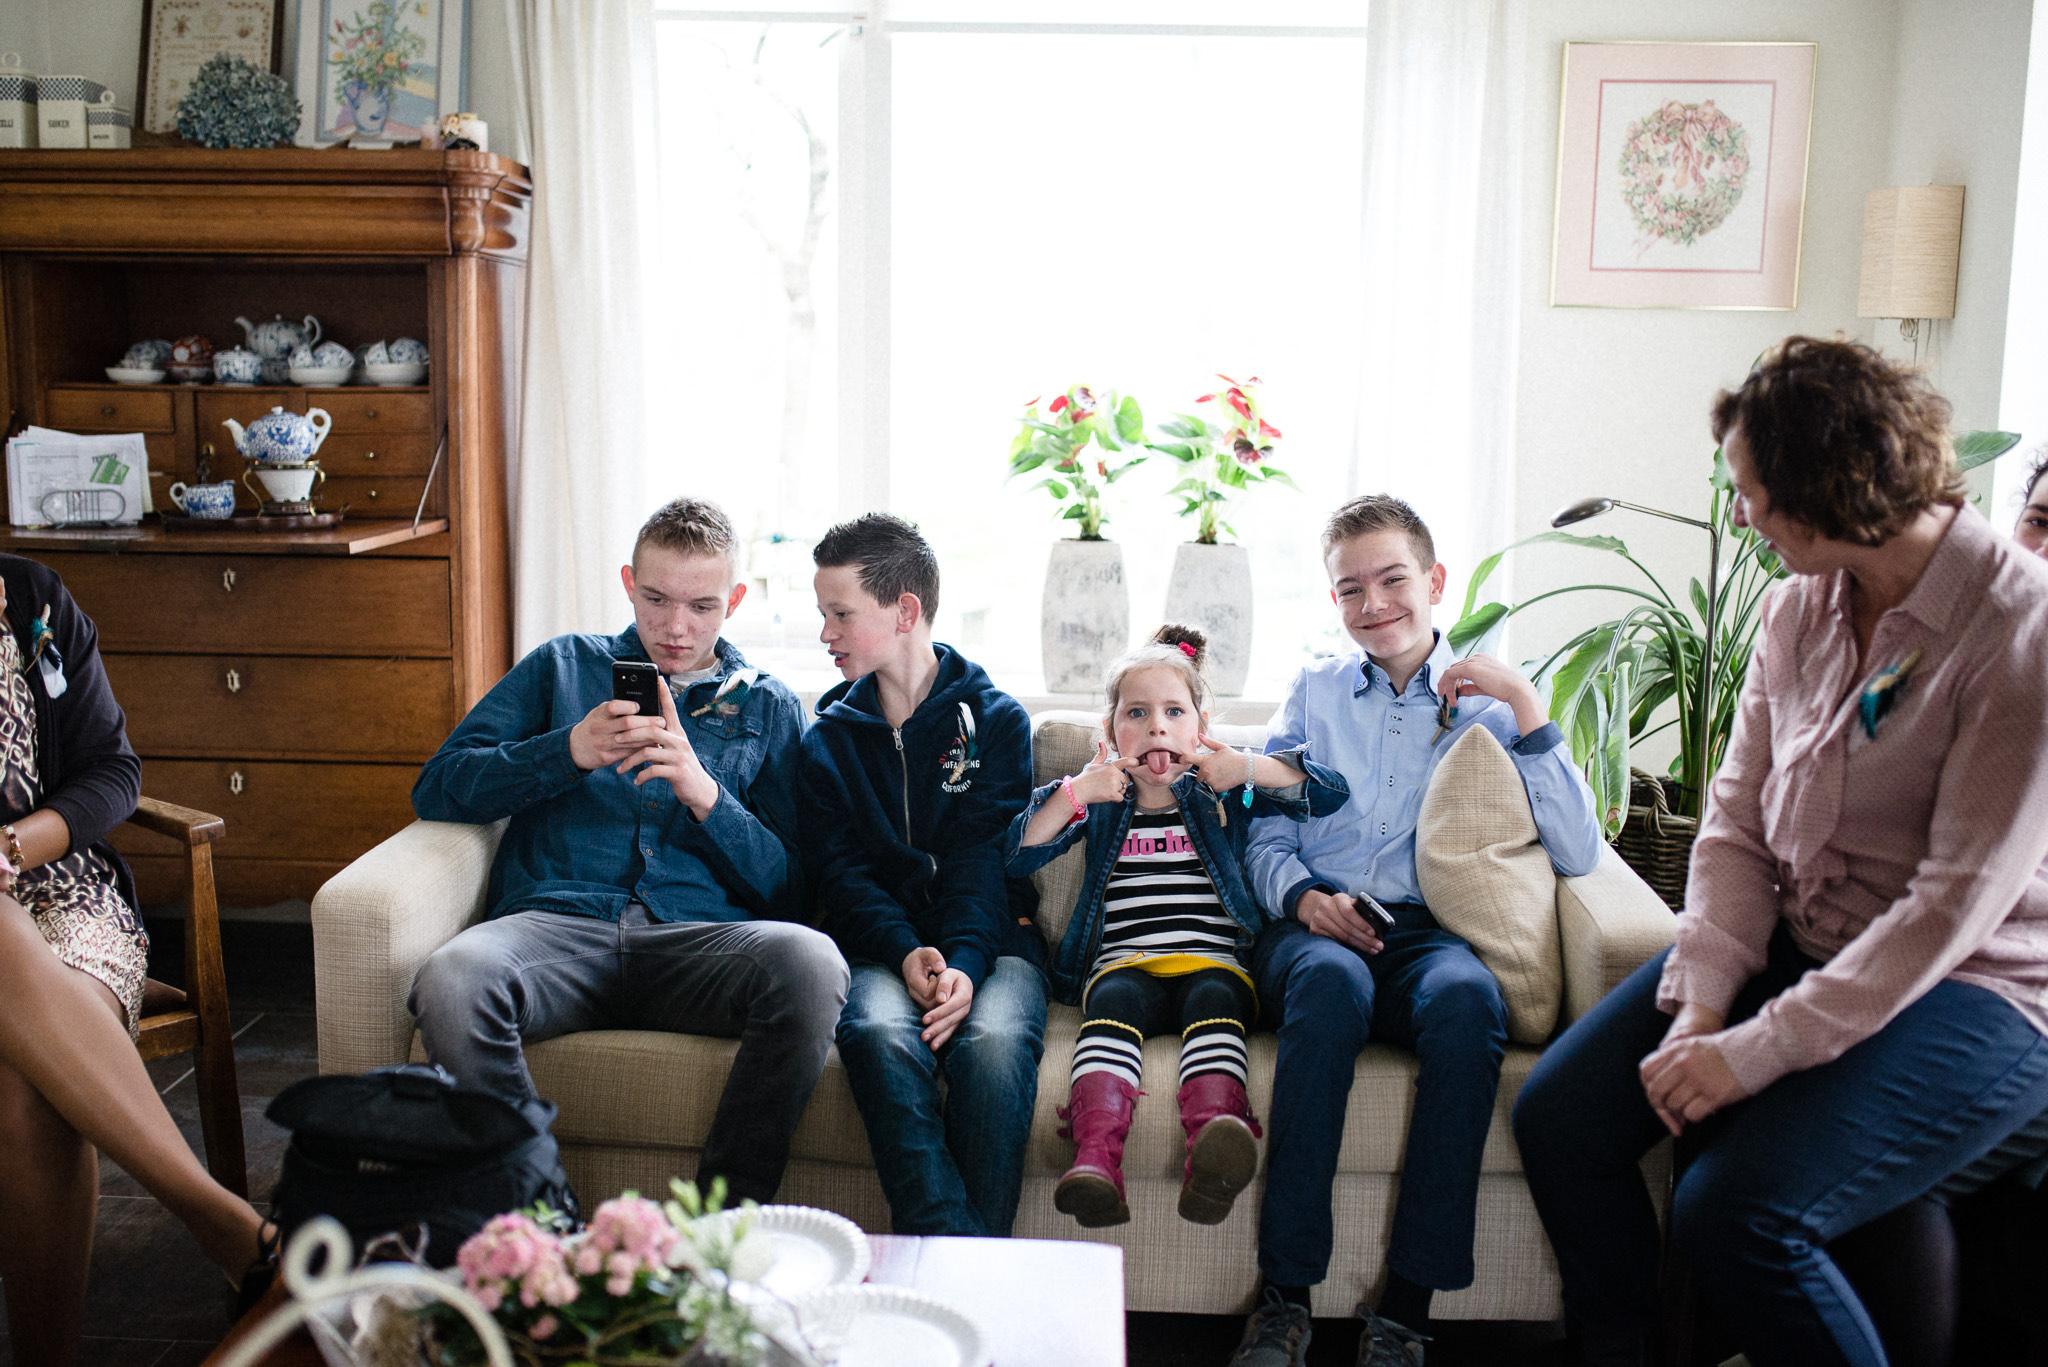 27 van 51 - trouwfotografie-gelske-reinier-friesland - 2358